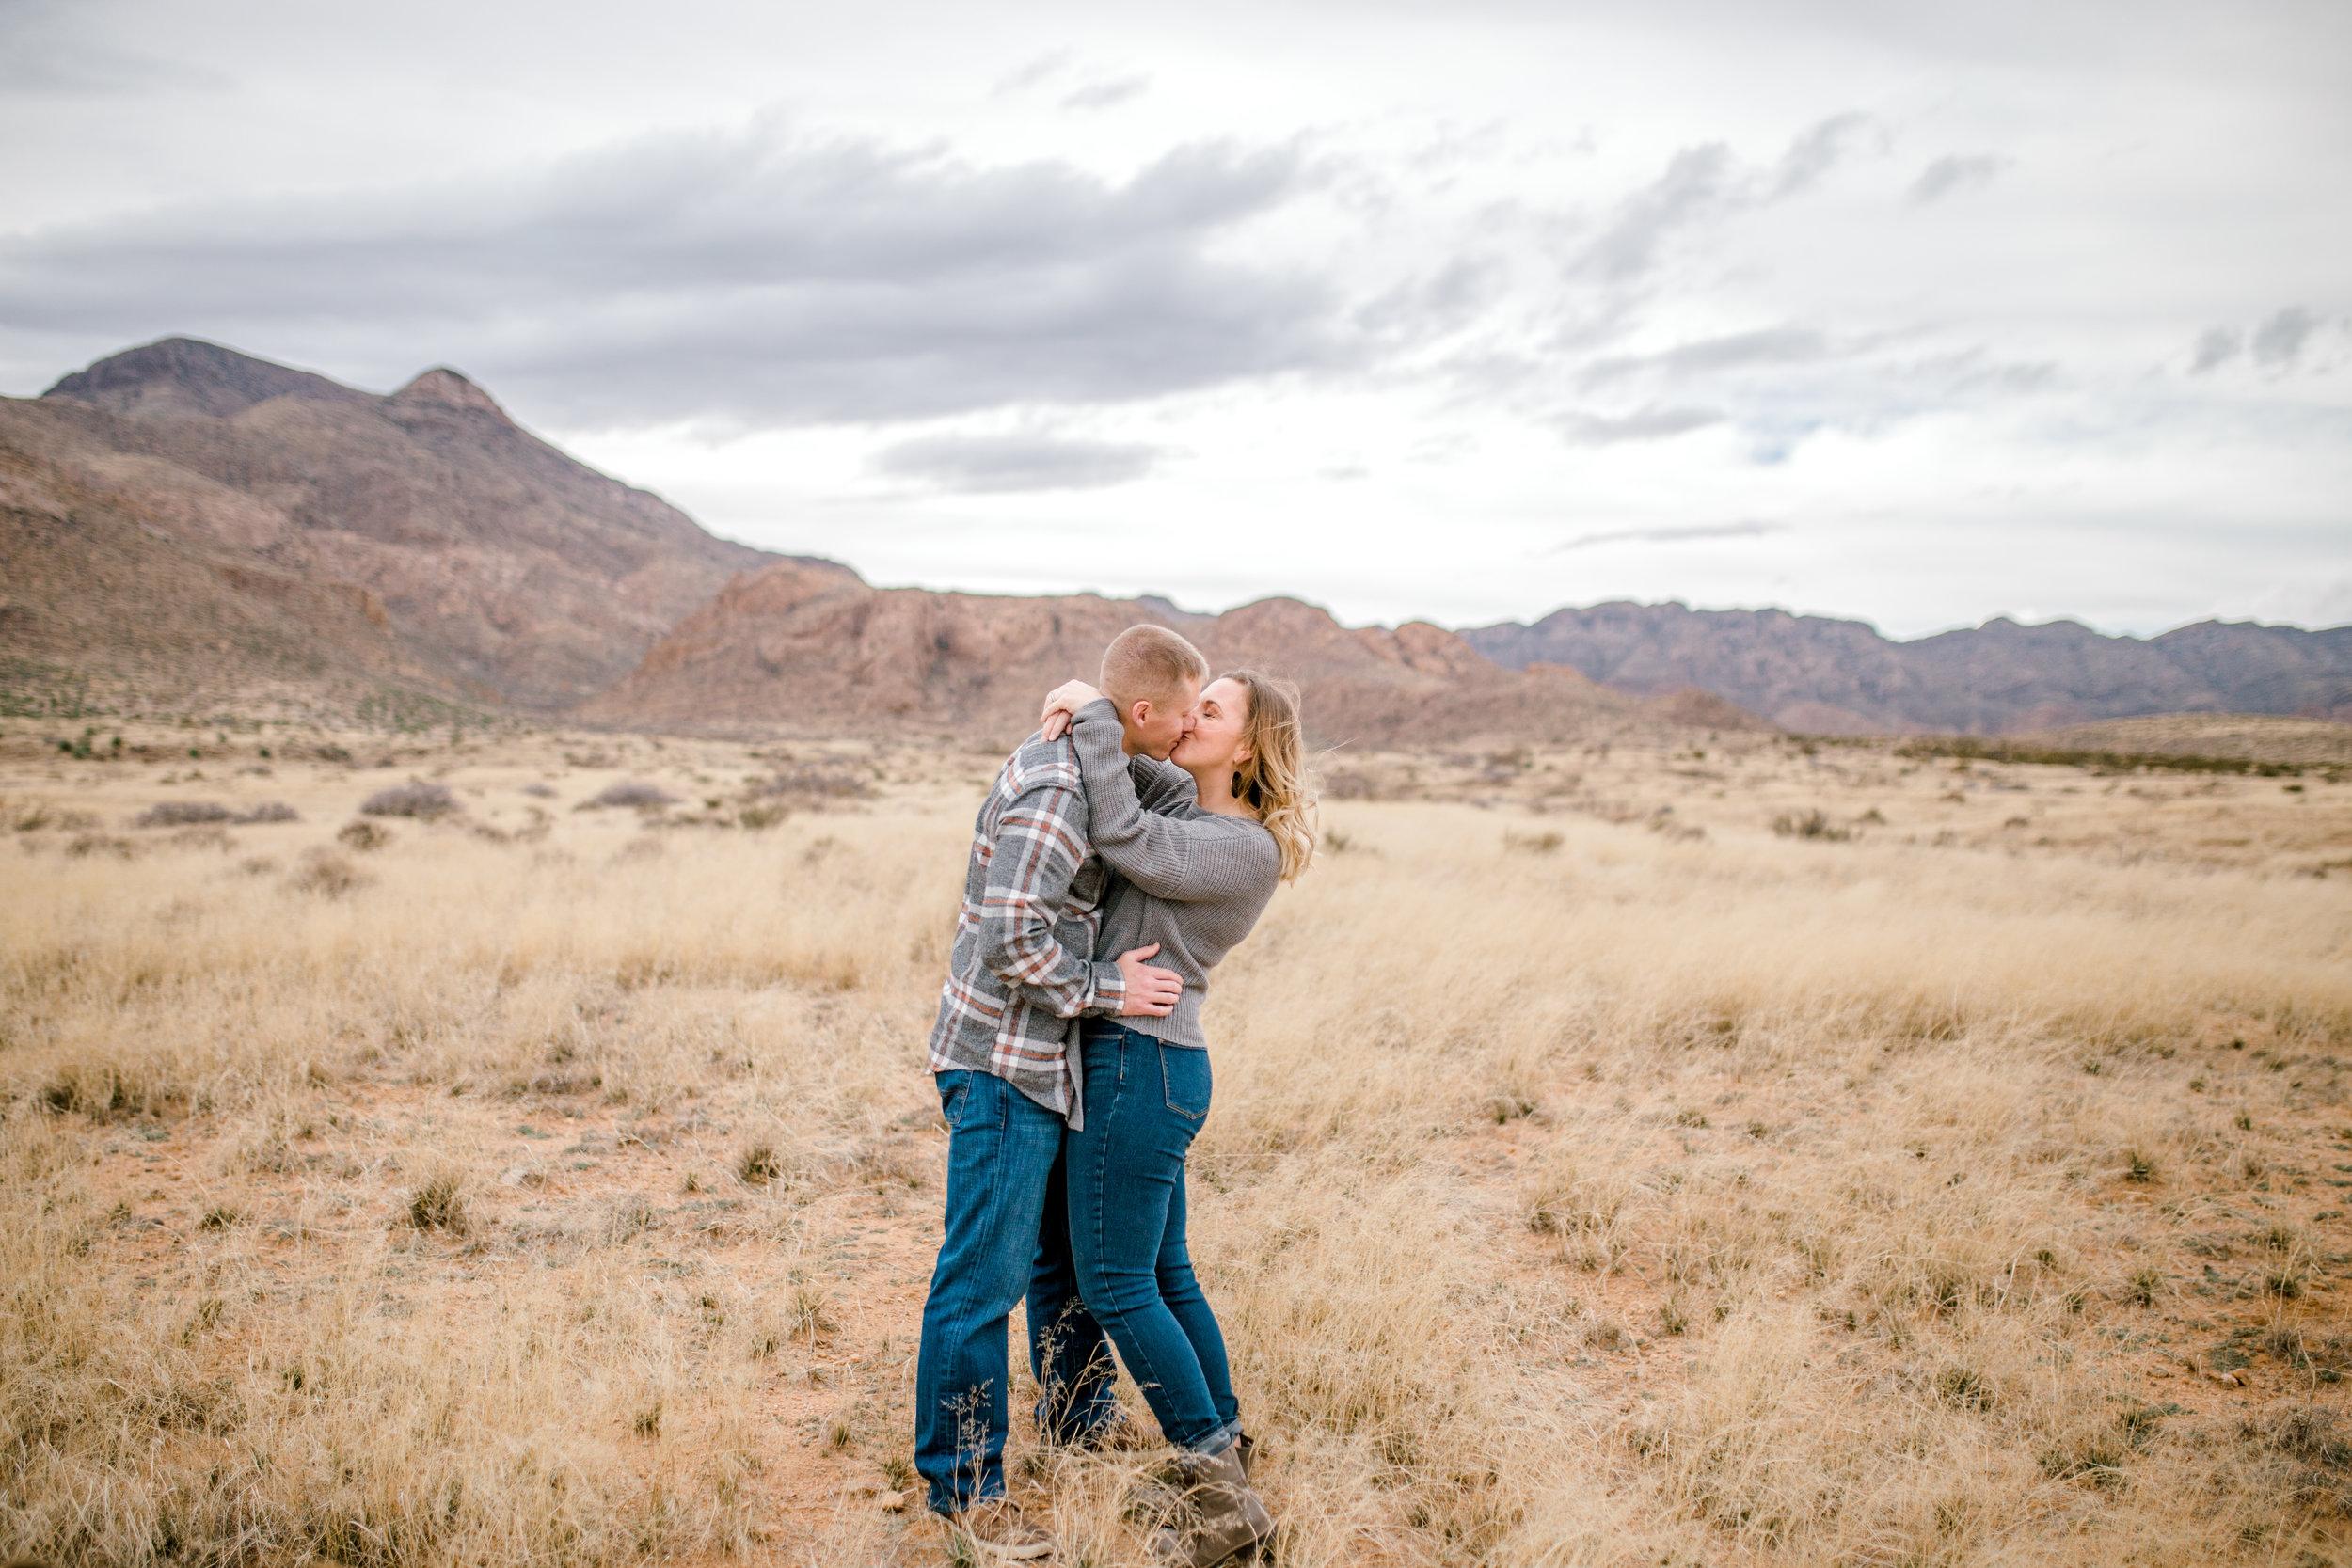 couples-franklin-mountains-el-paso-photographer-7